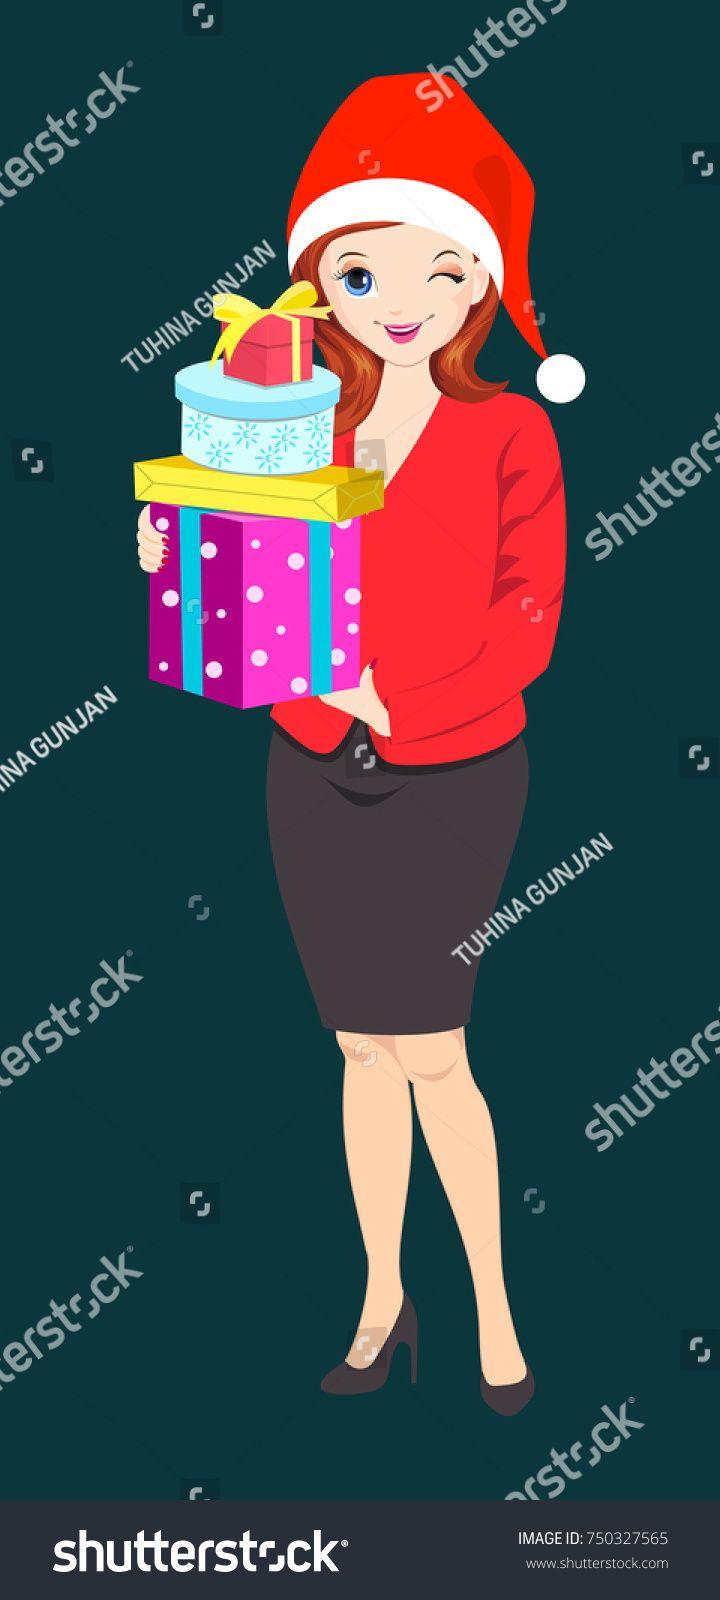 stock-vector-business-woman-celebrating-christmas-750327565.jpg (720×1600)